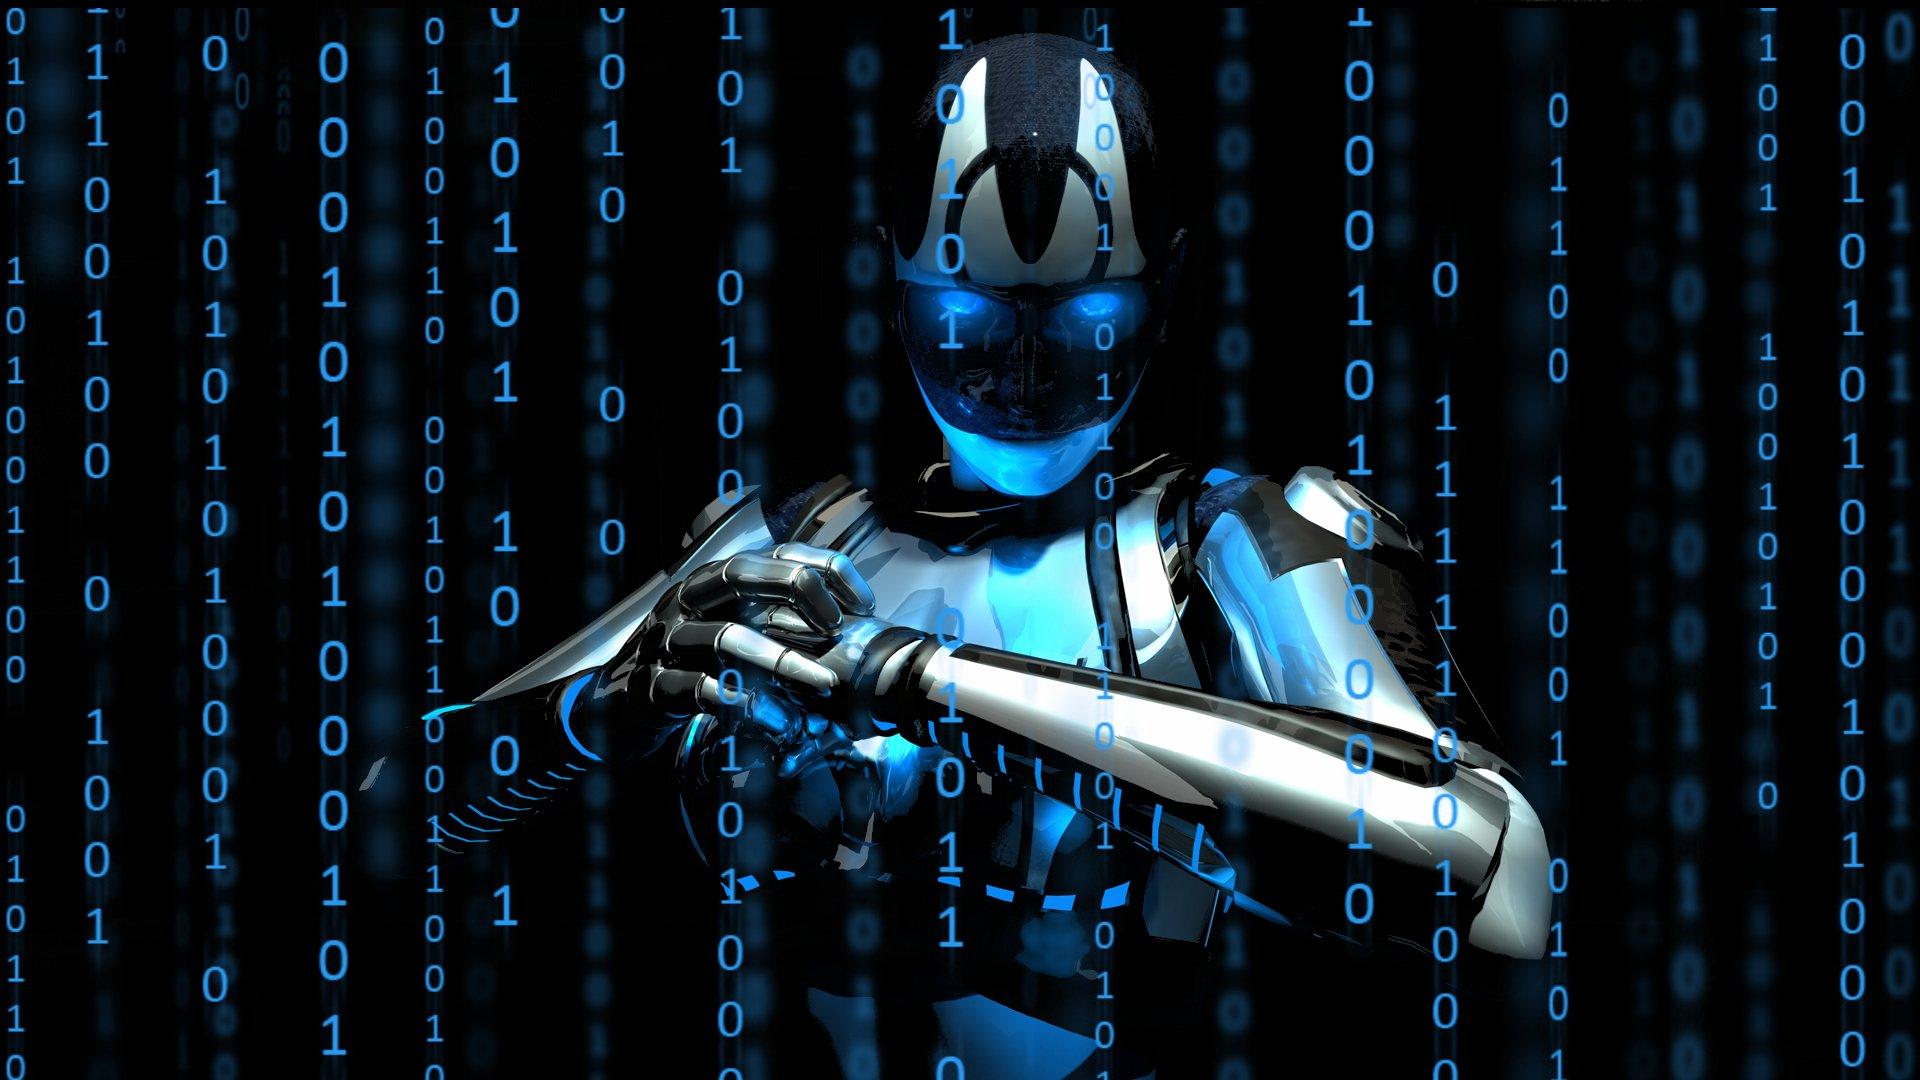 Sci Fi Robot Wallpaper HD 1 hd background hd screensavers hd wallpaper ...